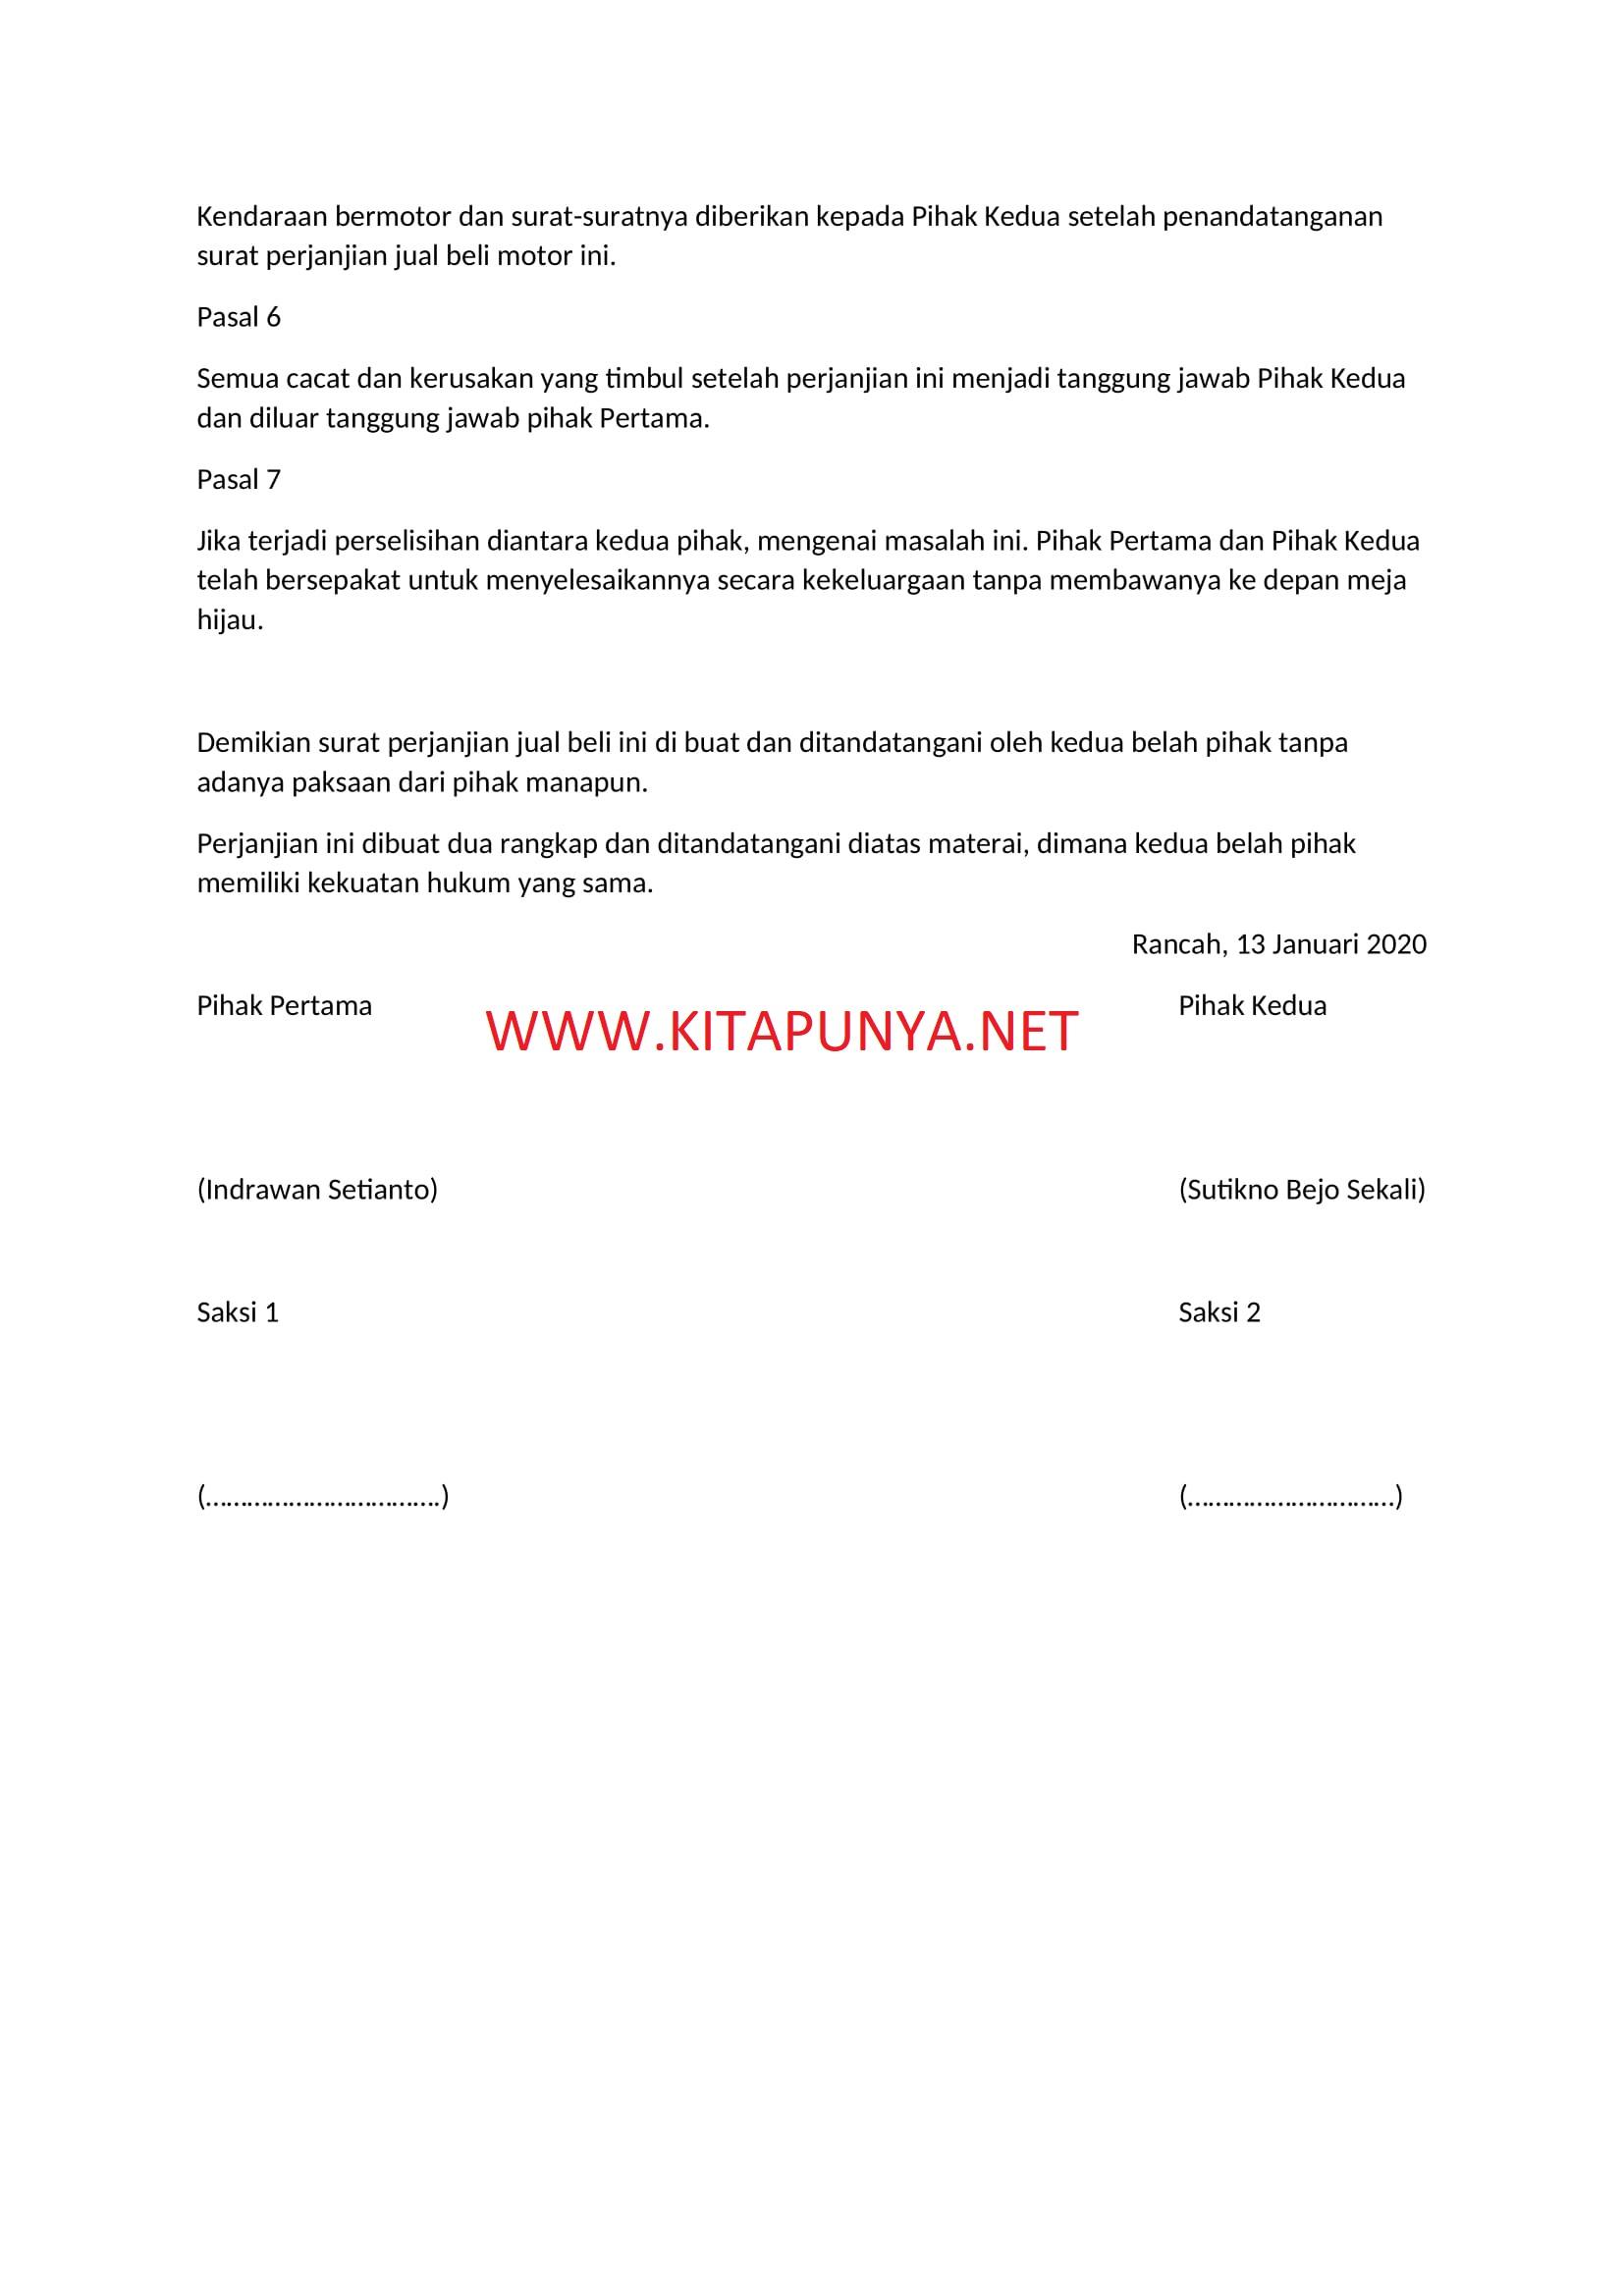 surat perjanjian beli motor sederhana